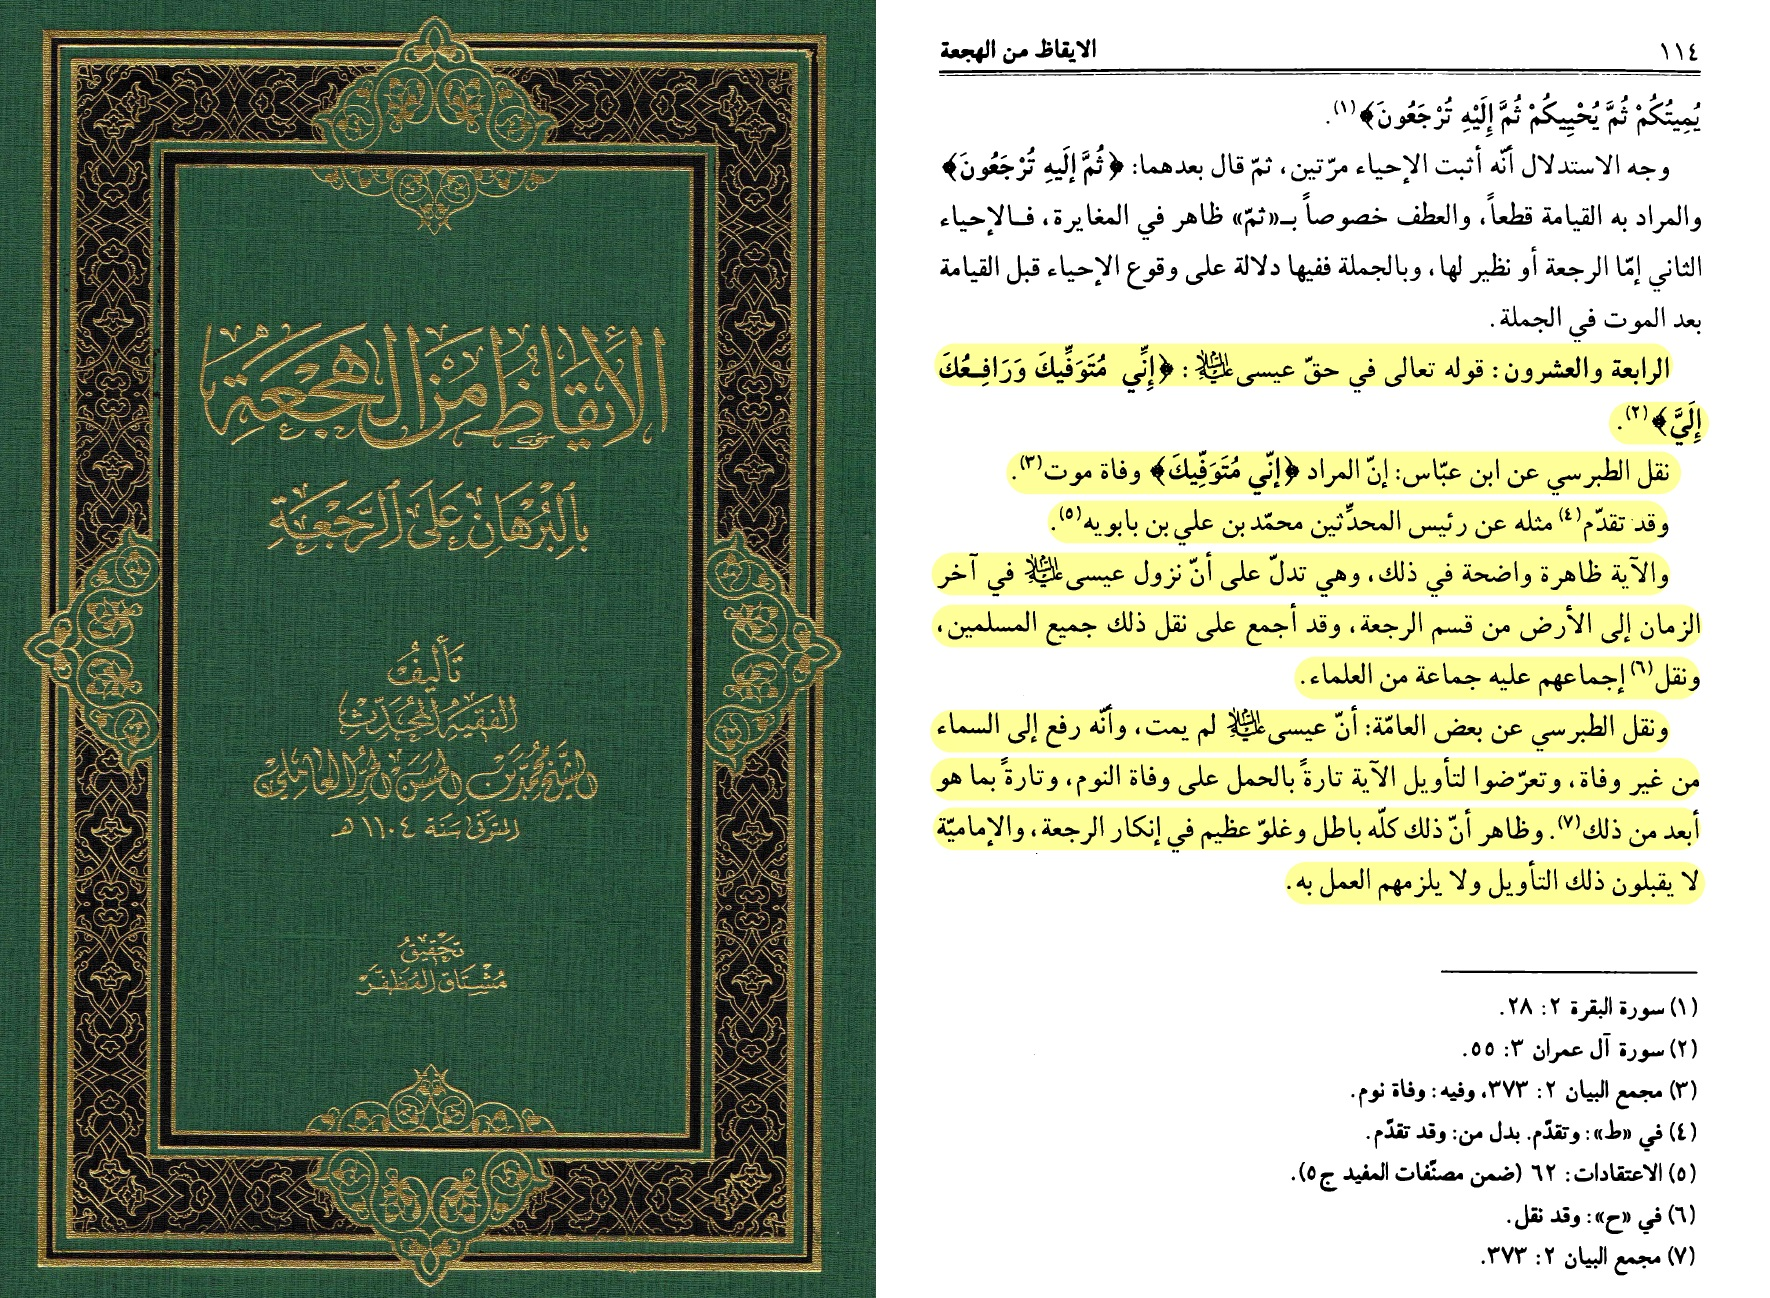 iqaz-e-3ameli-s-114